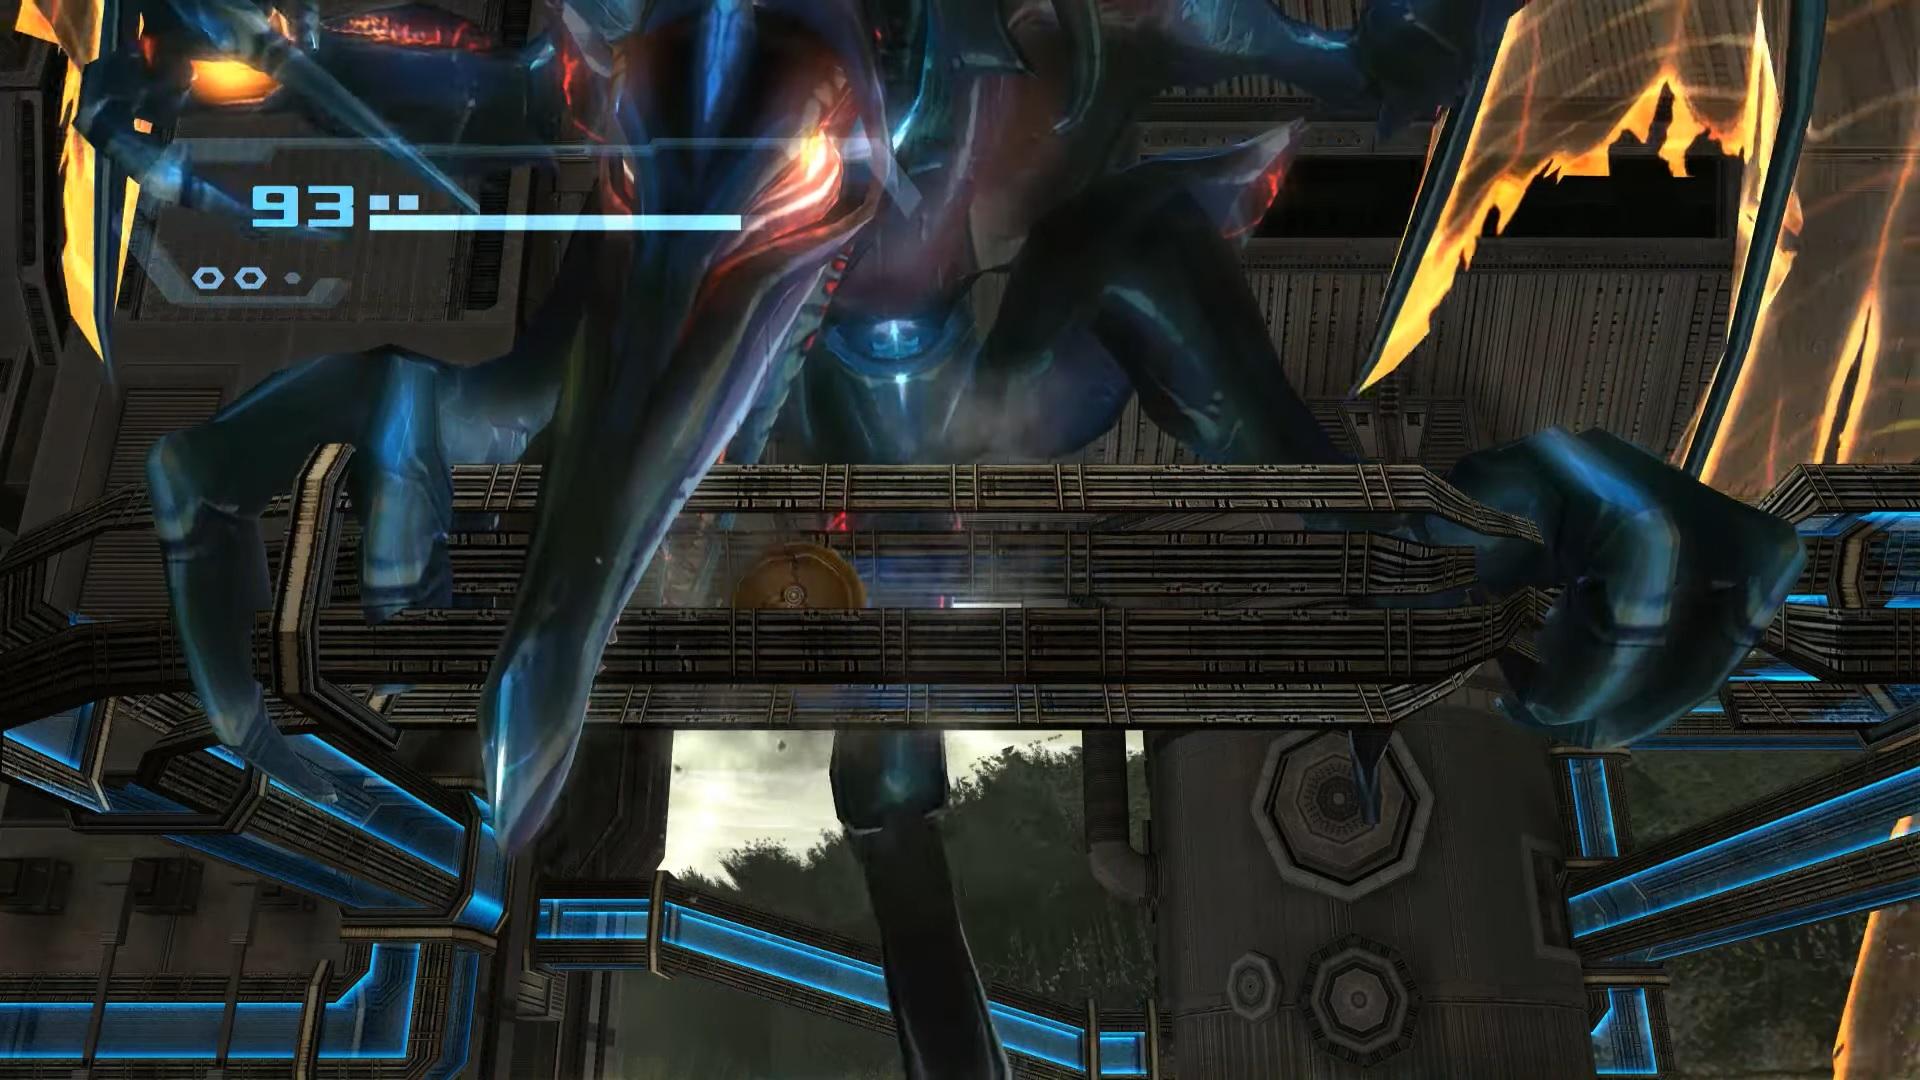 File:Metroid-prime-3-corruption-20070822001407631.jpg